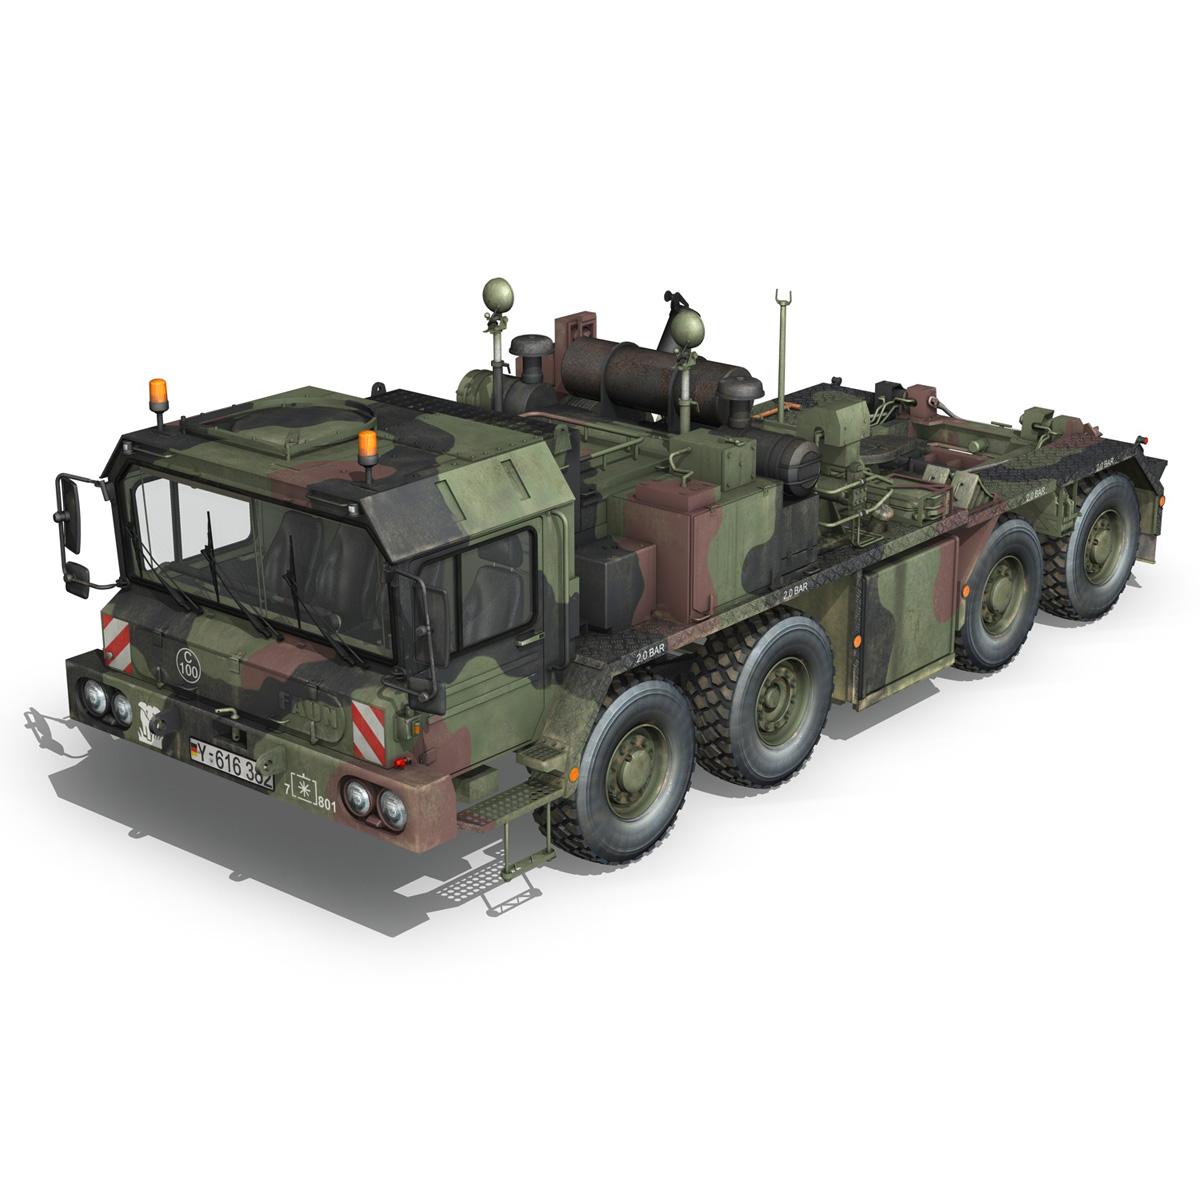 faun stl-56 transportues tank 3d model 3ds fbx c4d lwo obj 201916